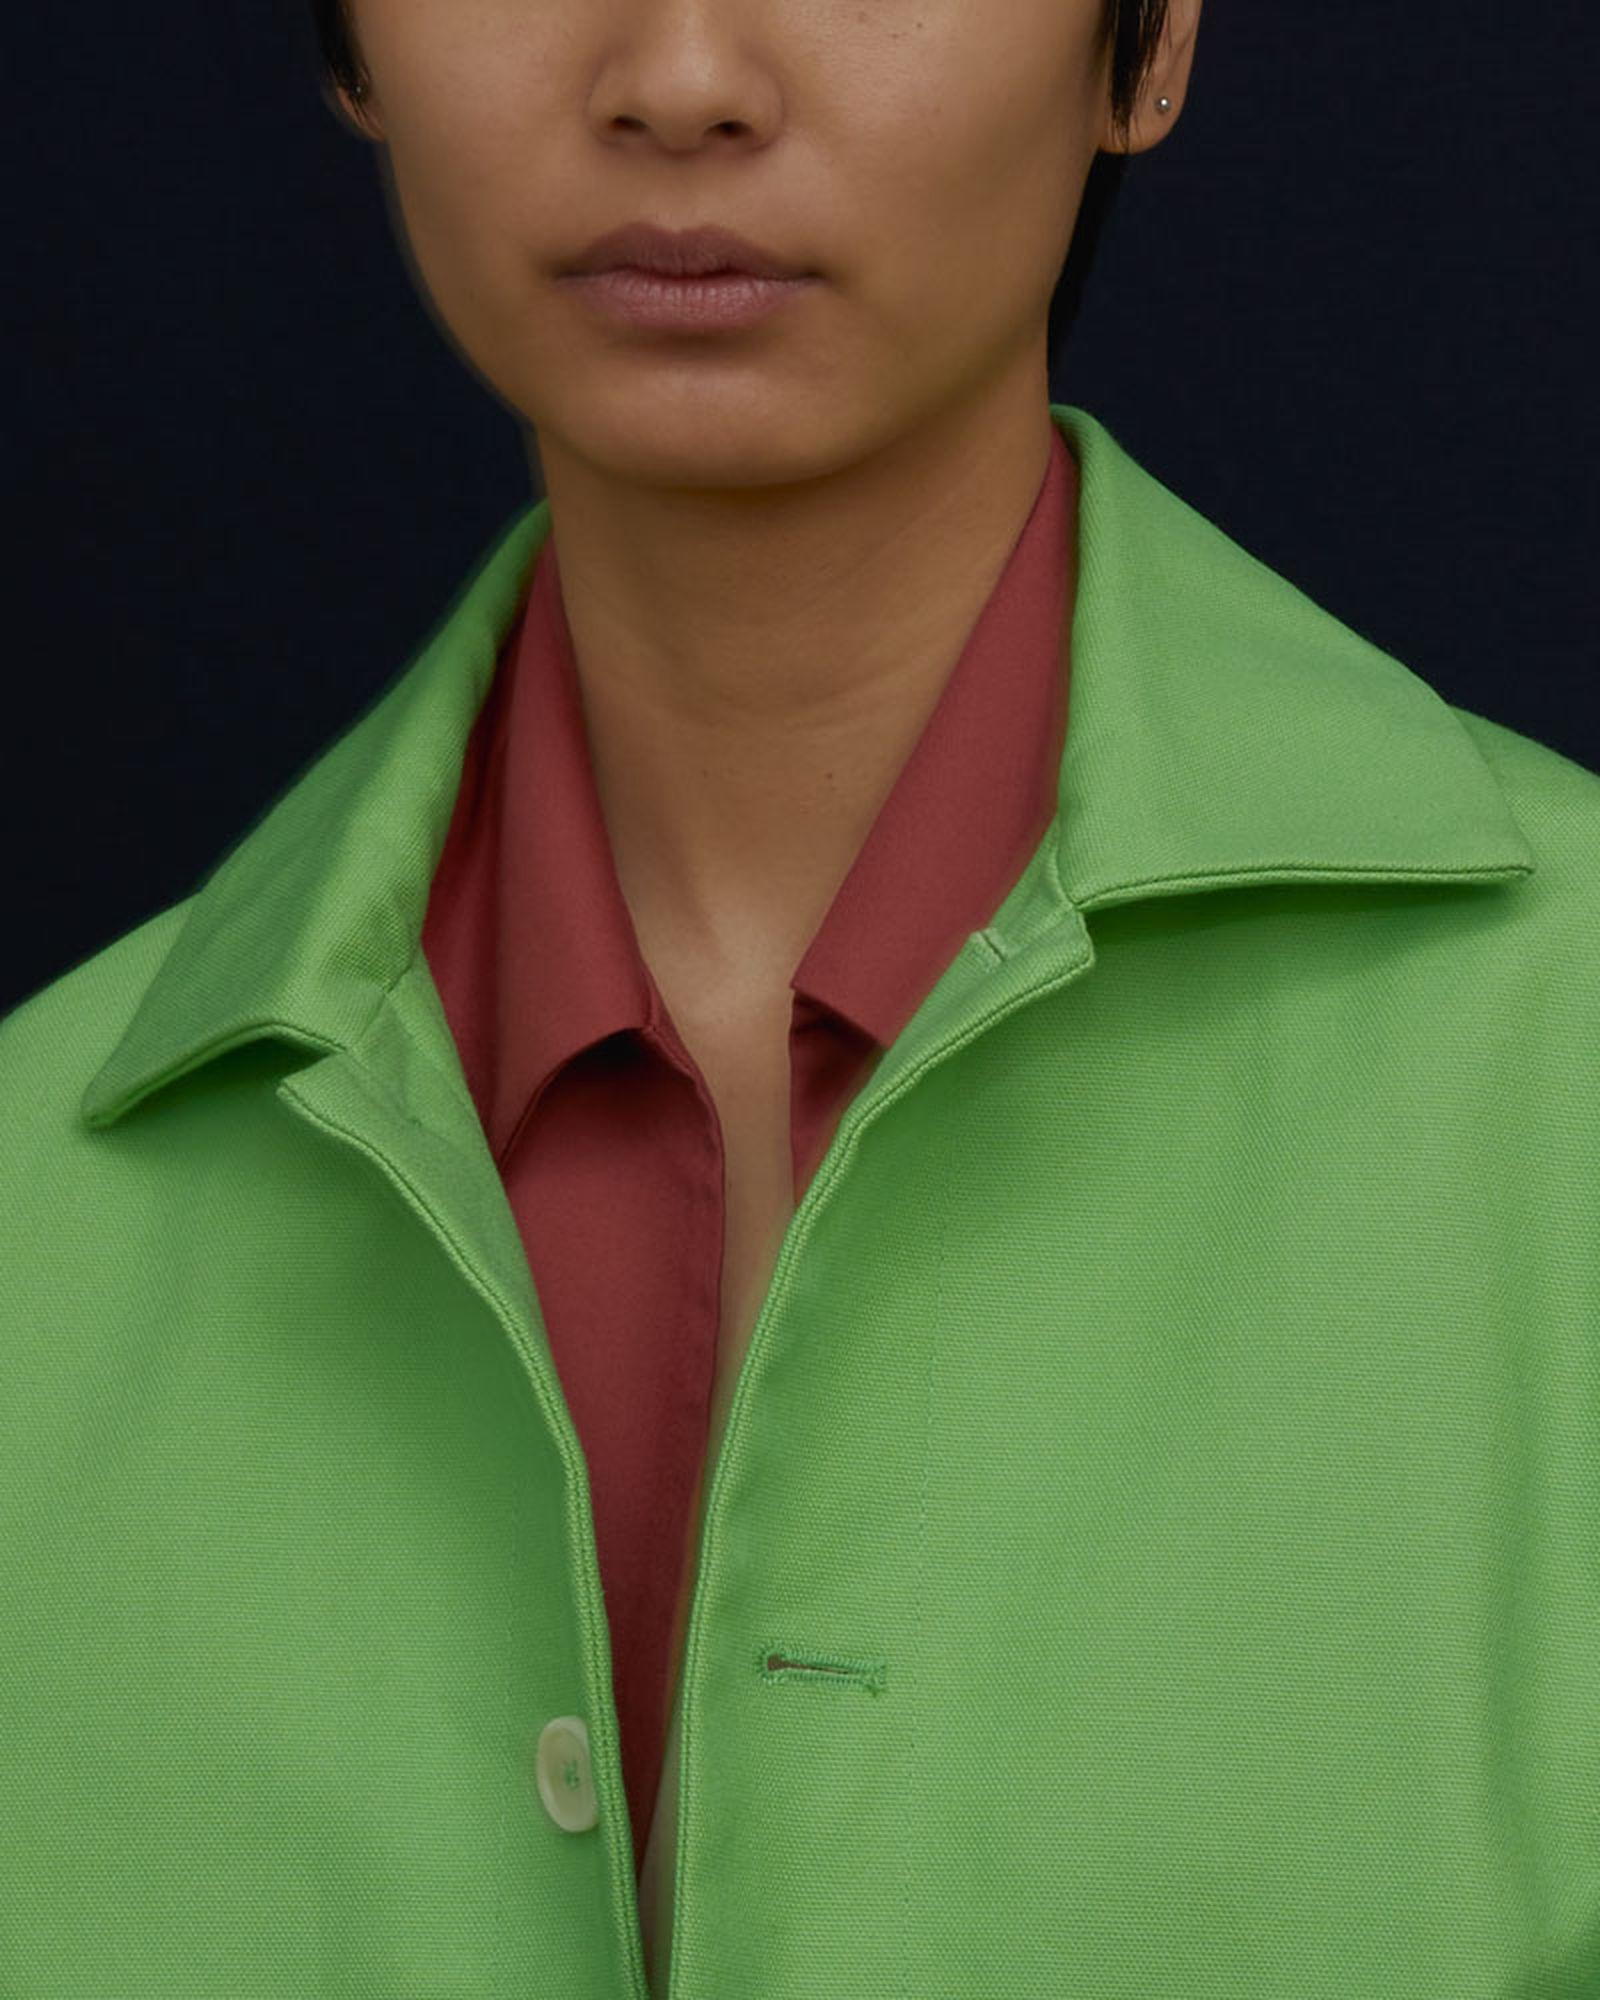 4one-dna-genderless-suiting-lookbook